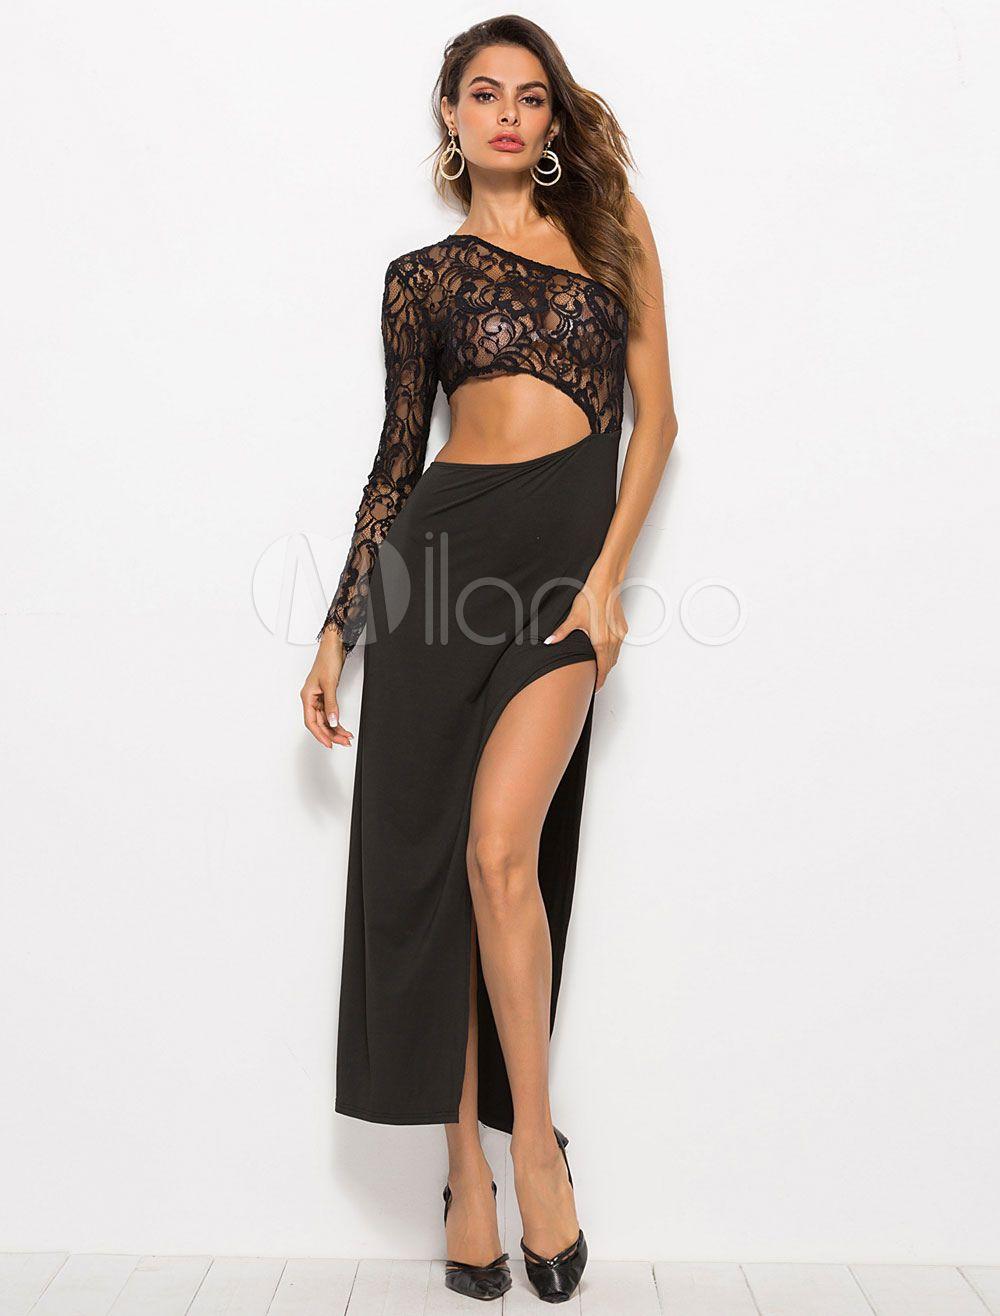 80a7cda6c37 Black Club Dress Long Sleeve One Shoulder Split Sexy Maxi Dress  Dress